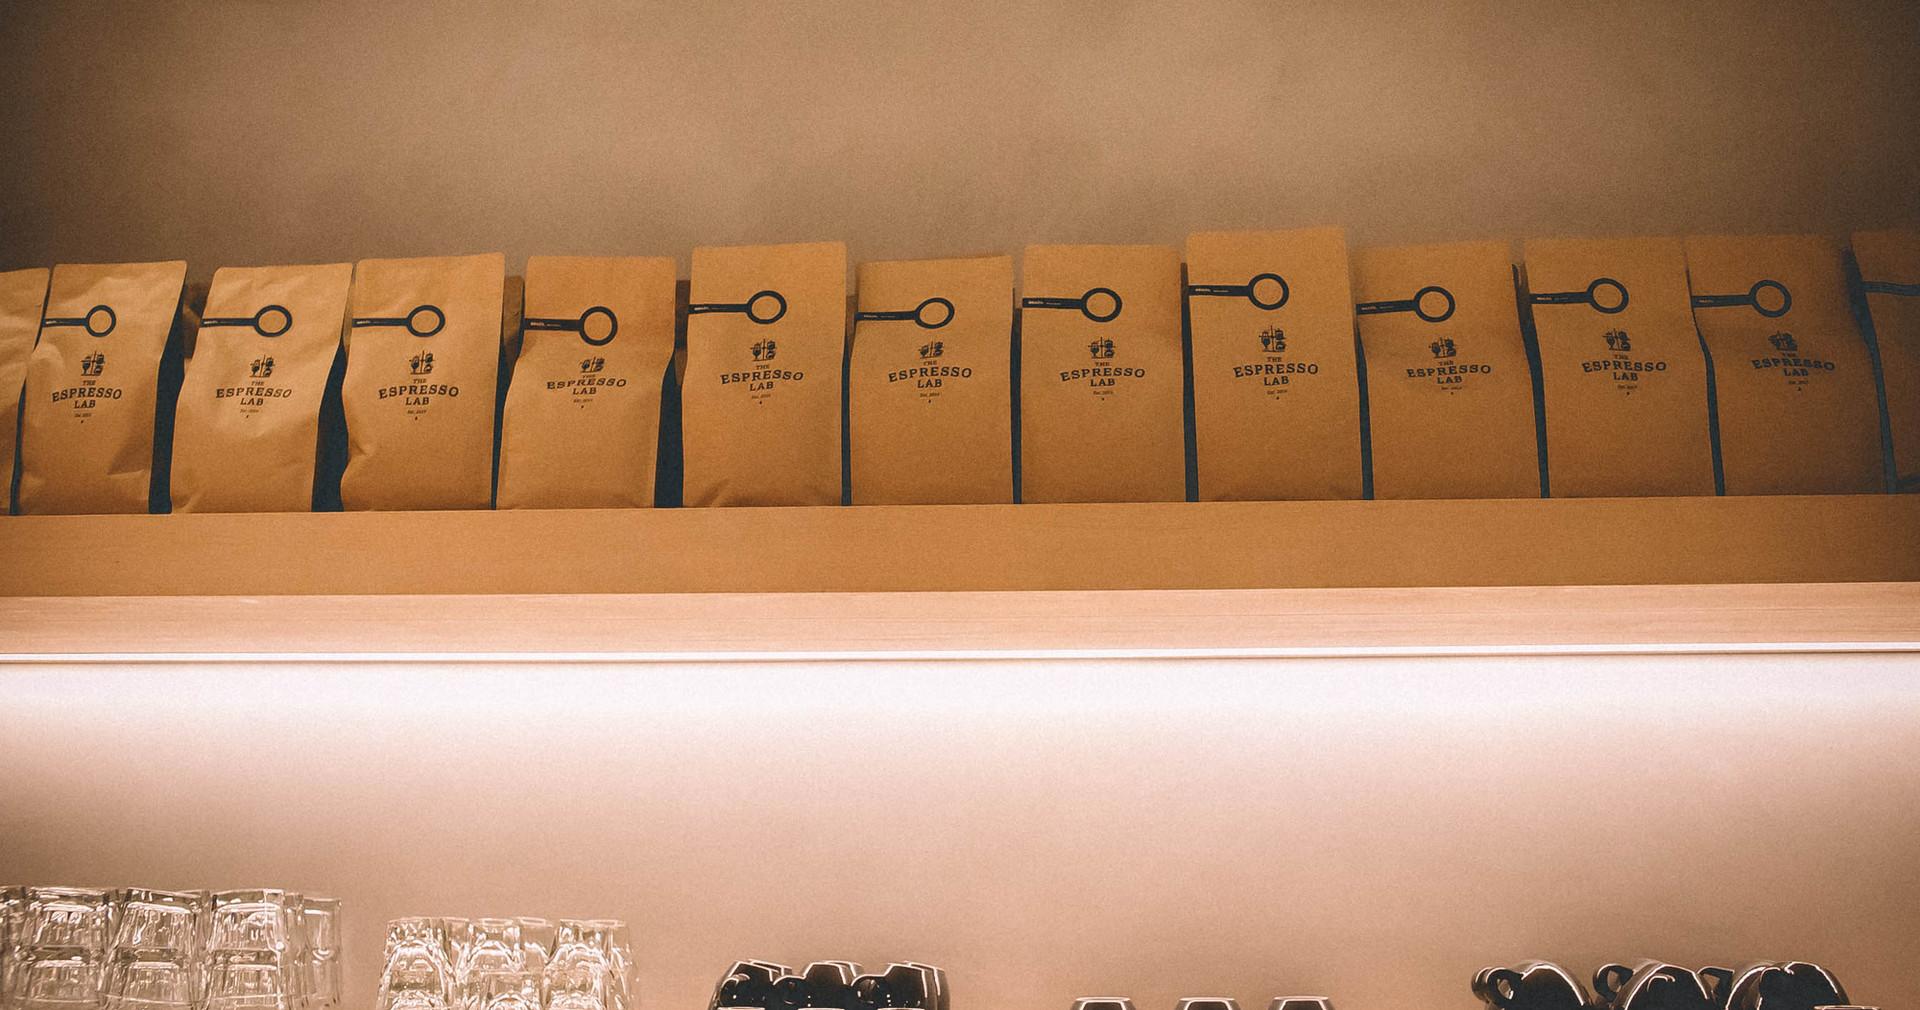 04 TLL Espresso Lab Coffee Bags Shelf.jp